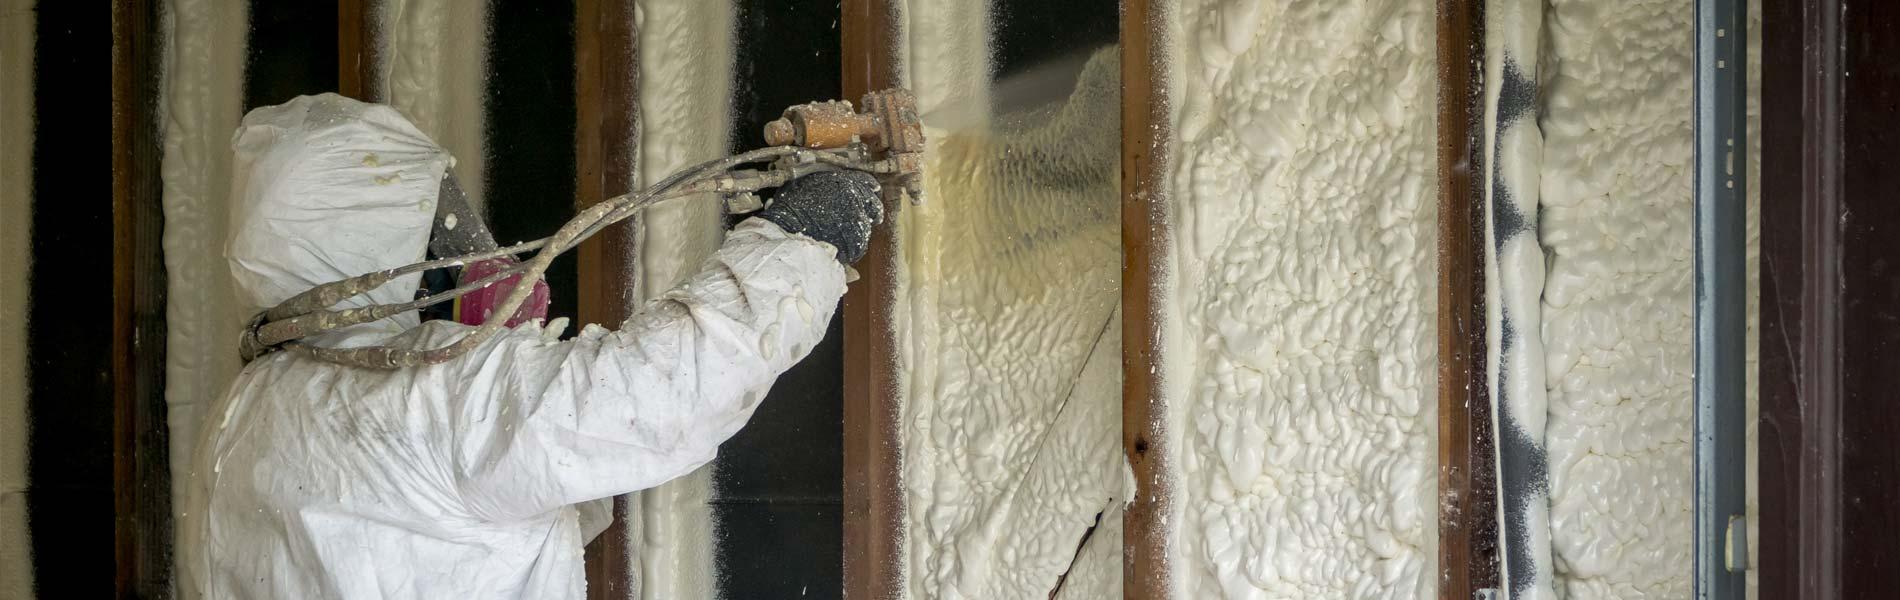 Polyurethane Foam Insulation Application - Pacific Urethanes